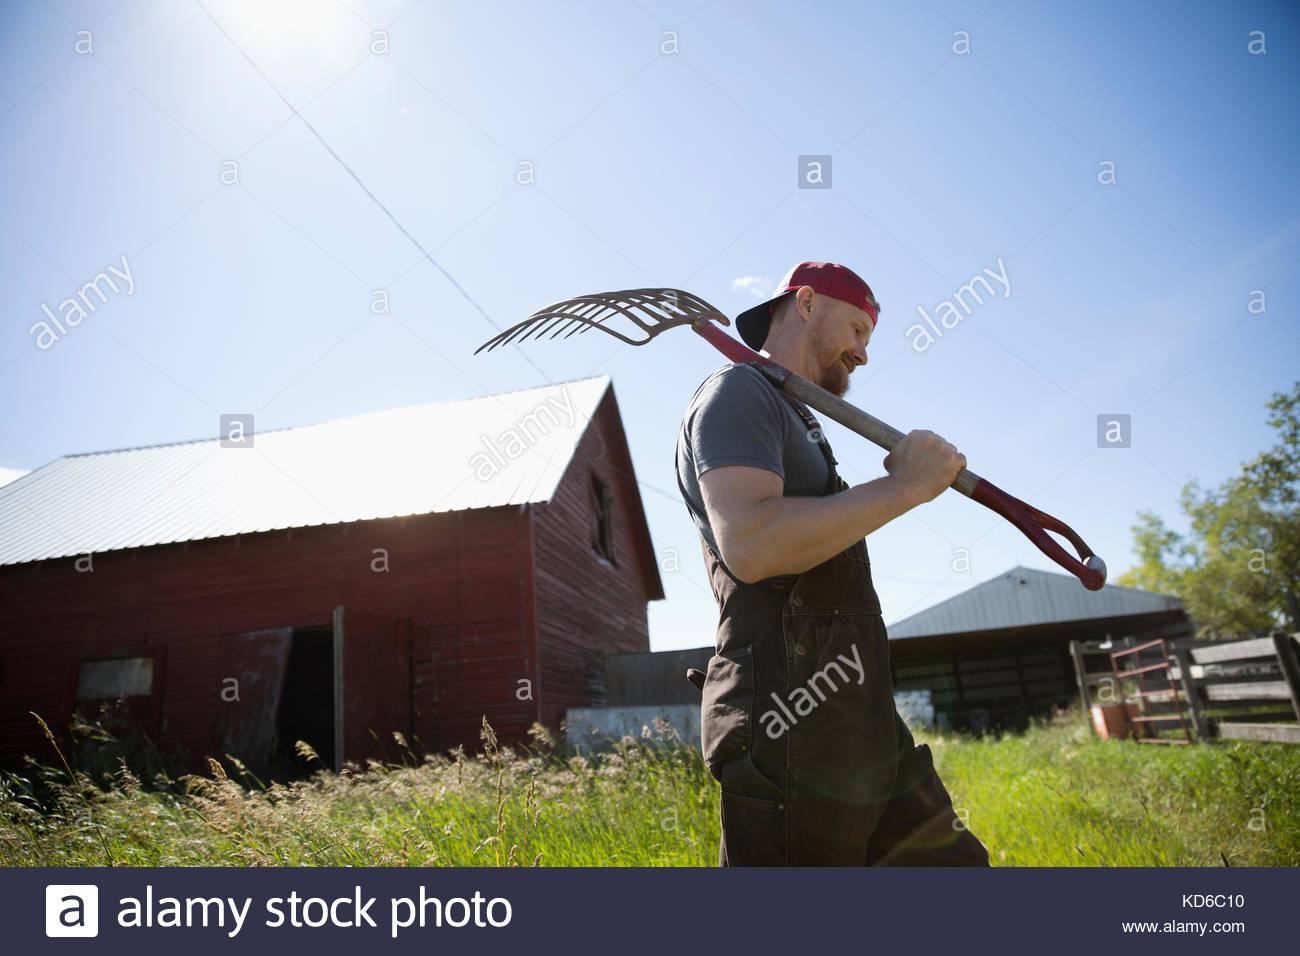 Male farmer carrying rake, walking on sunny farm outside barn - Stock Image